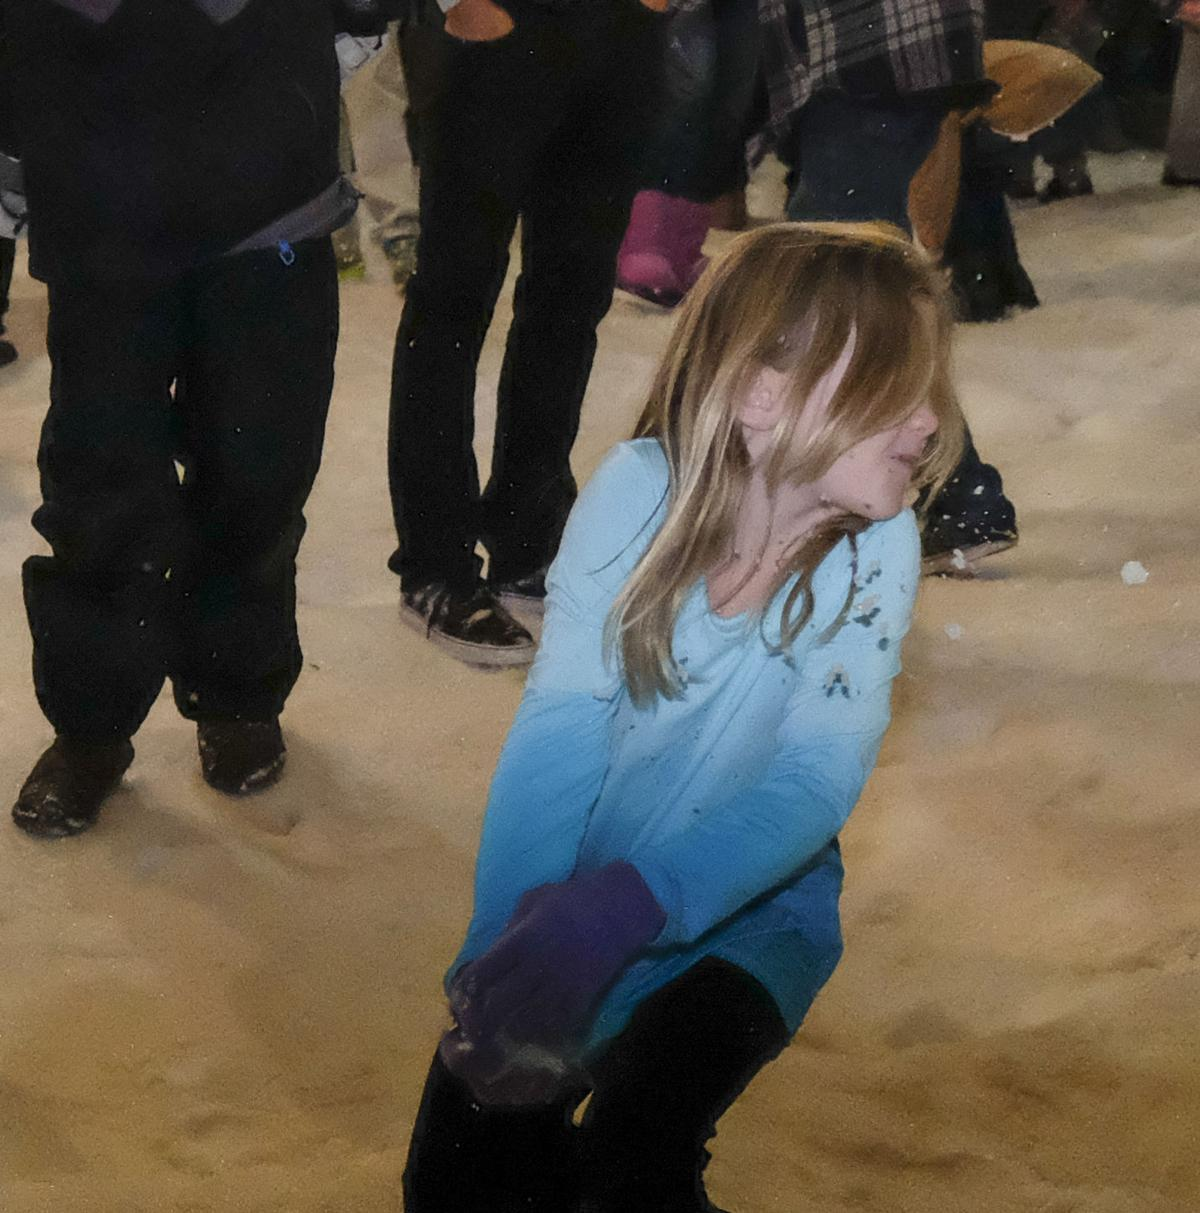 120317 Buellton Winter Fest 02.jpg